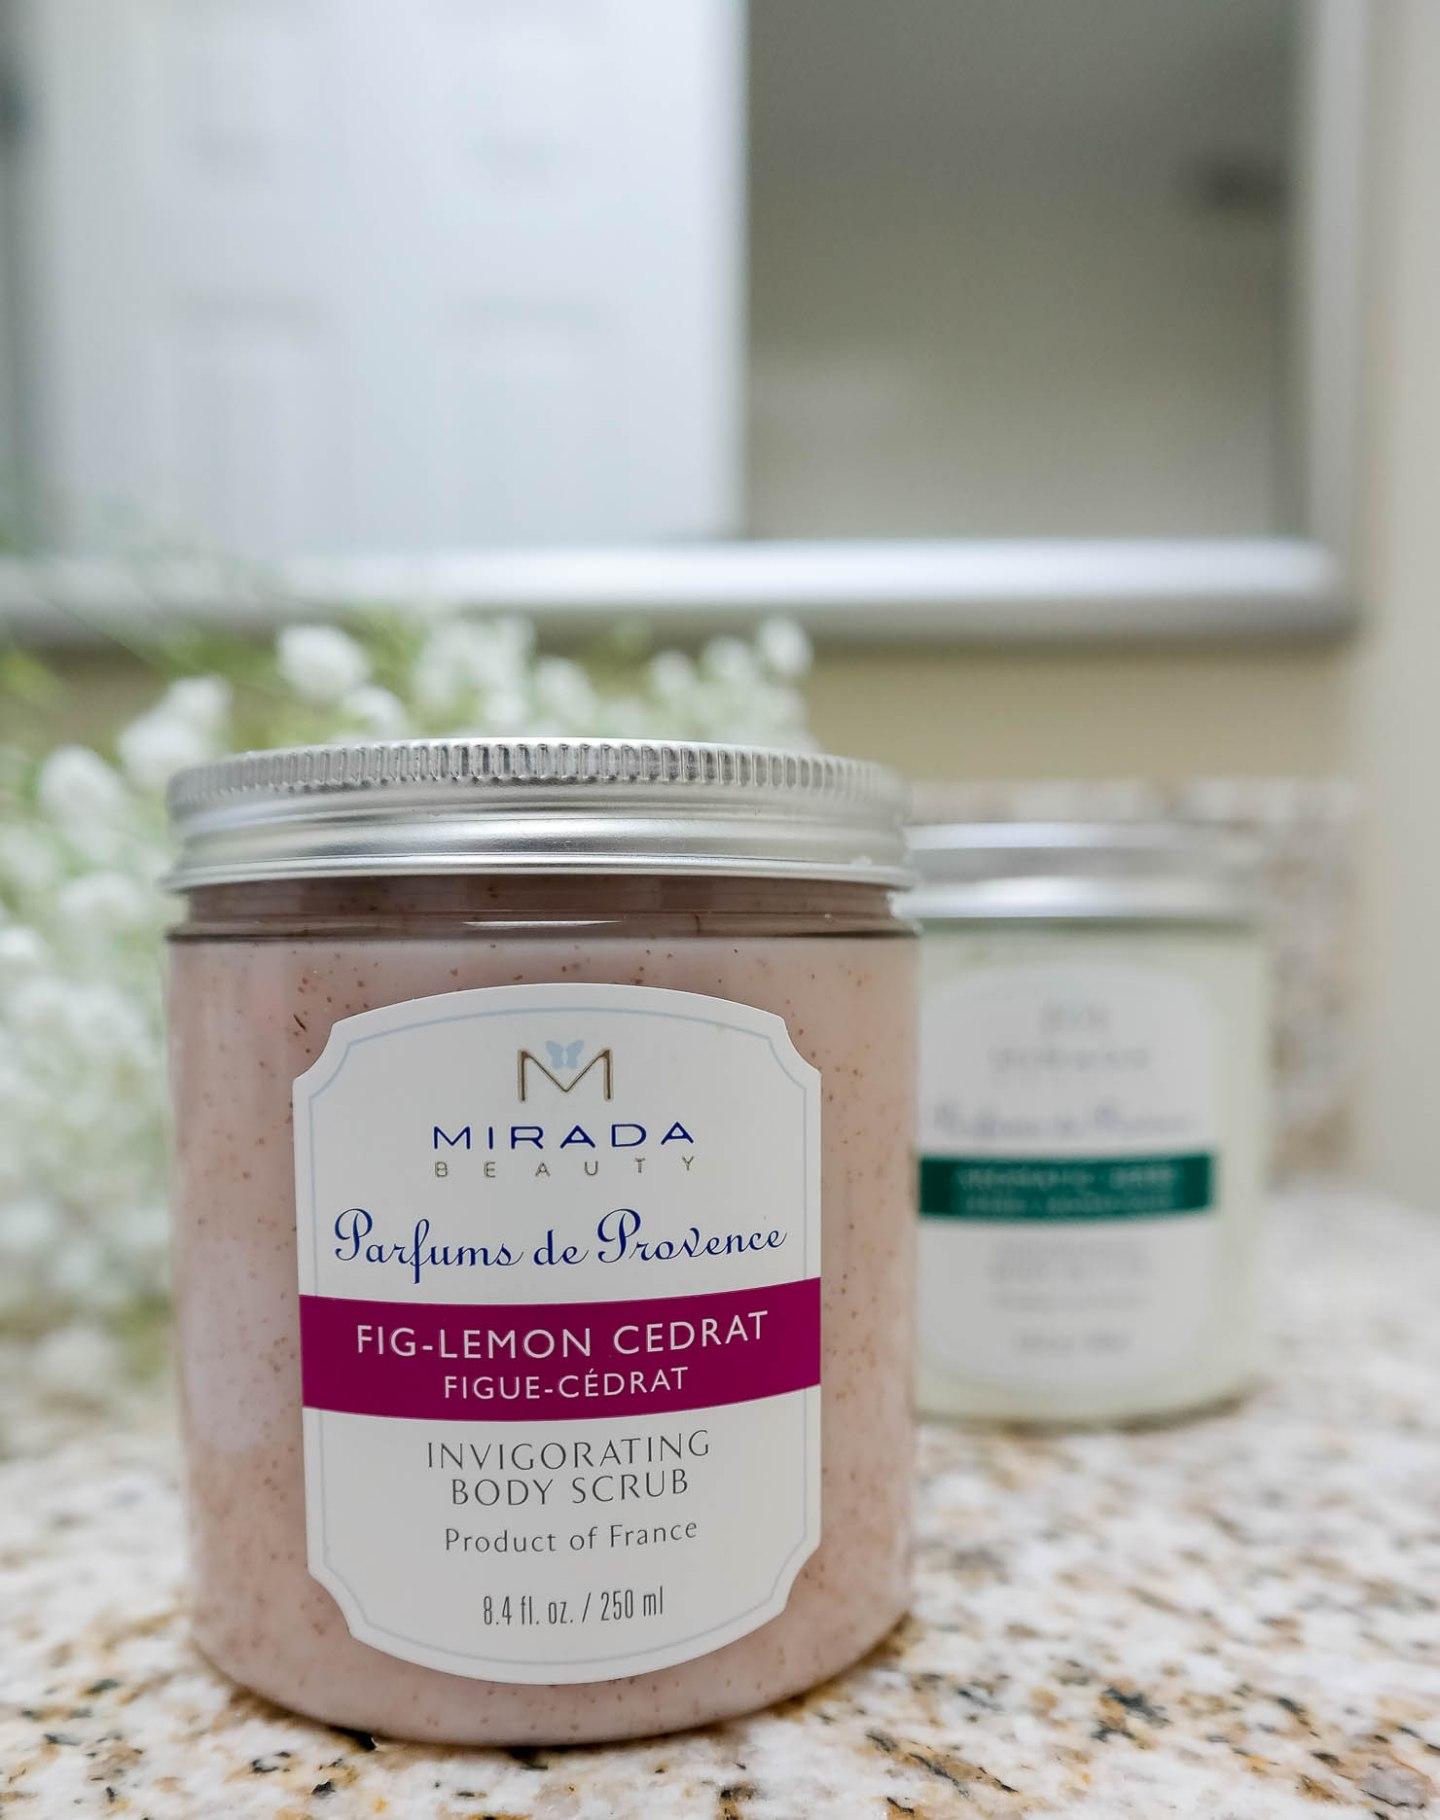 mirada-de-provence-power-of-scent-aromatherapy-body-care-beauty